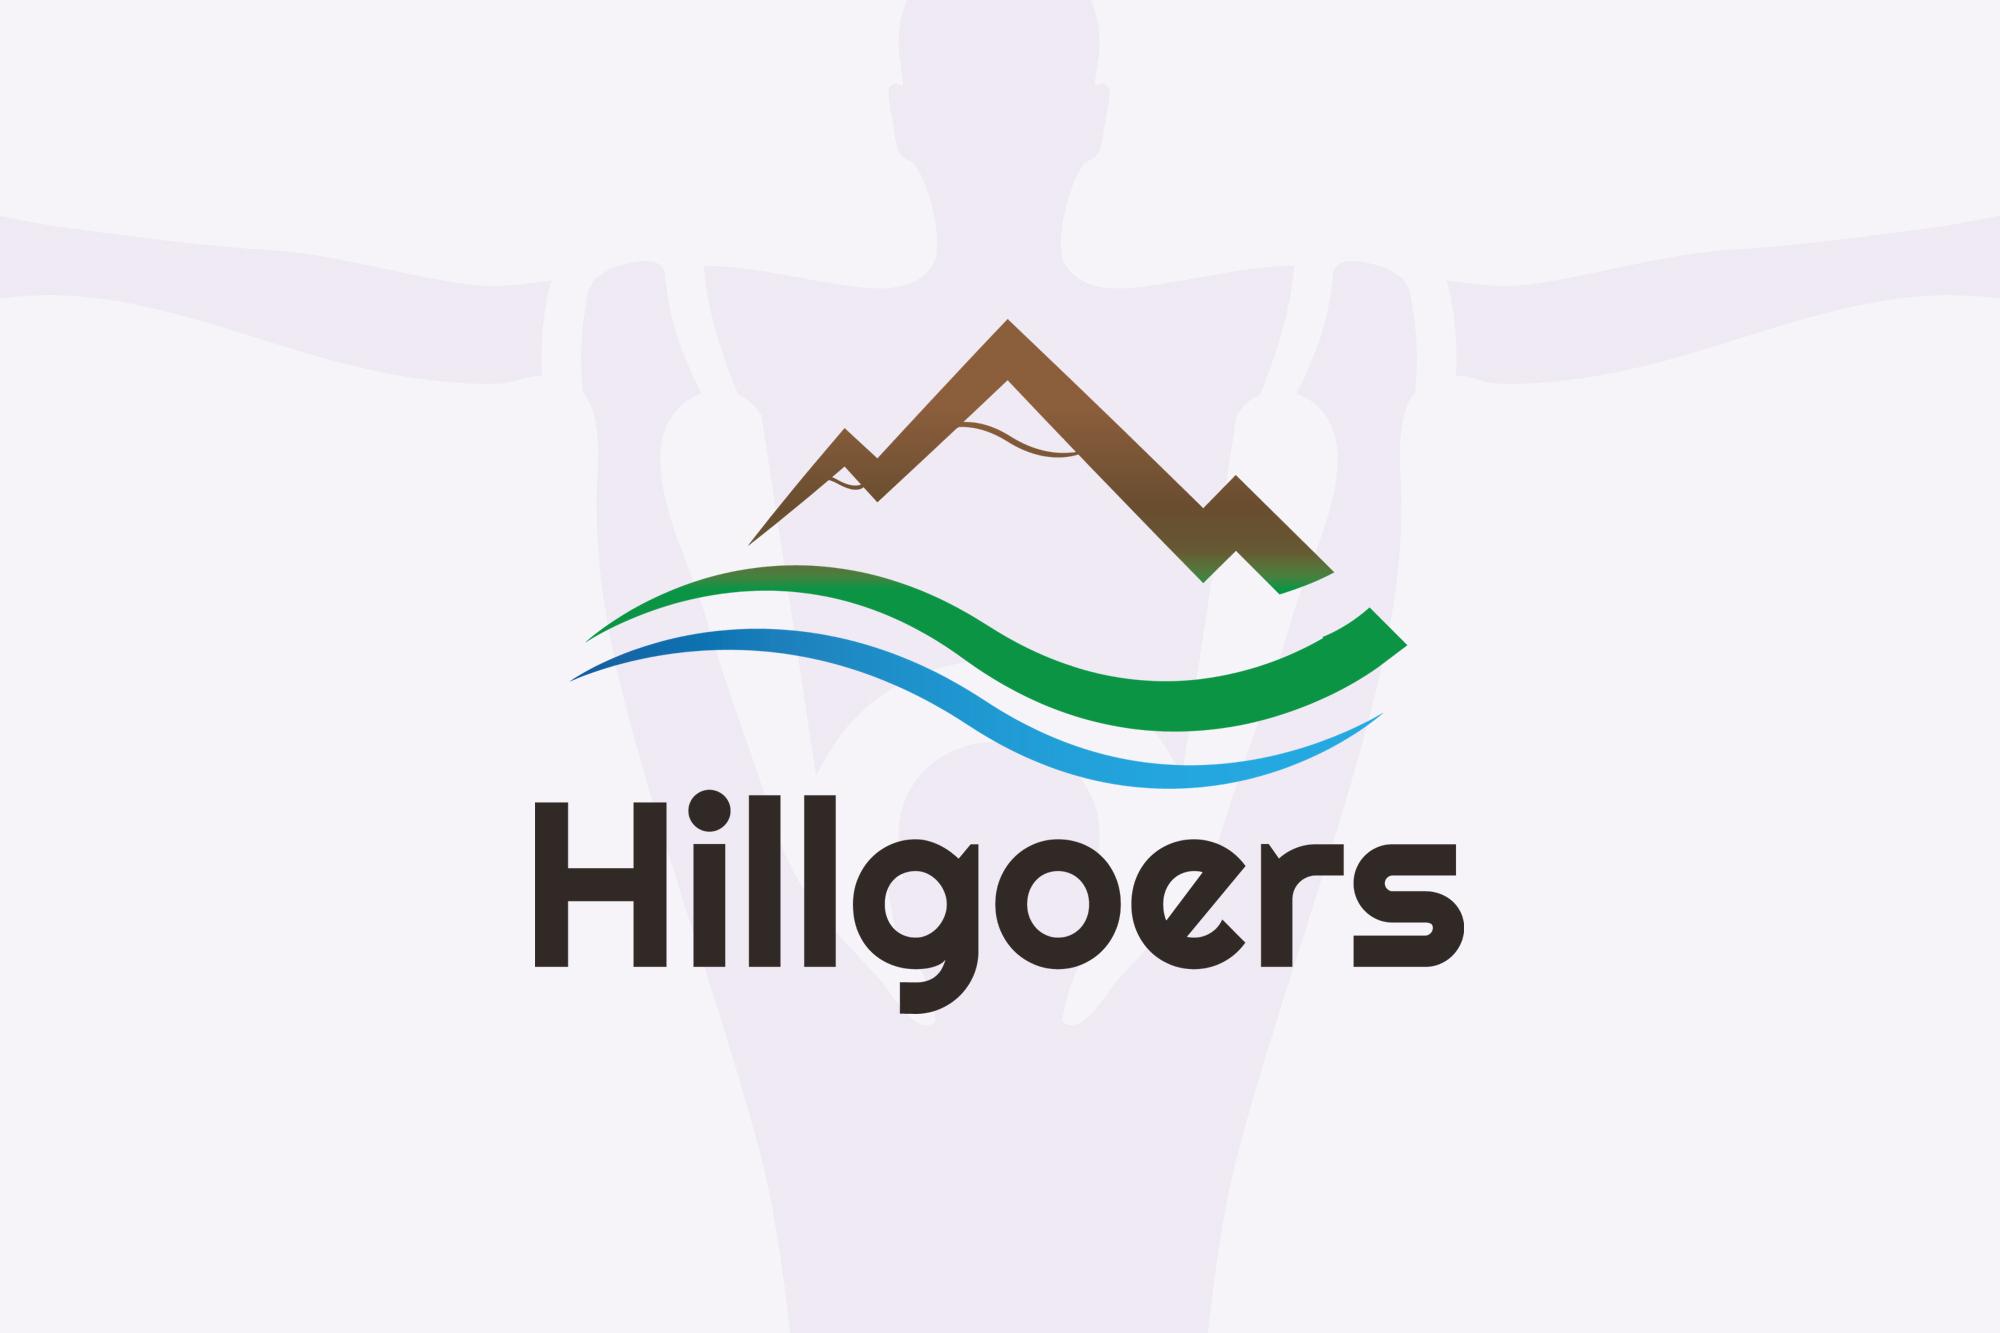 Hillgoers logo